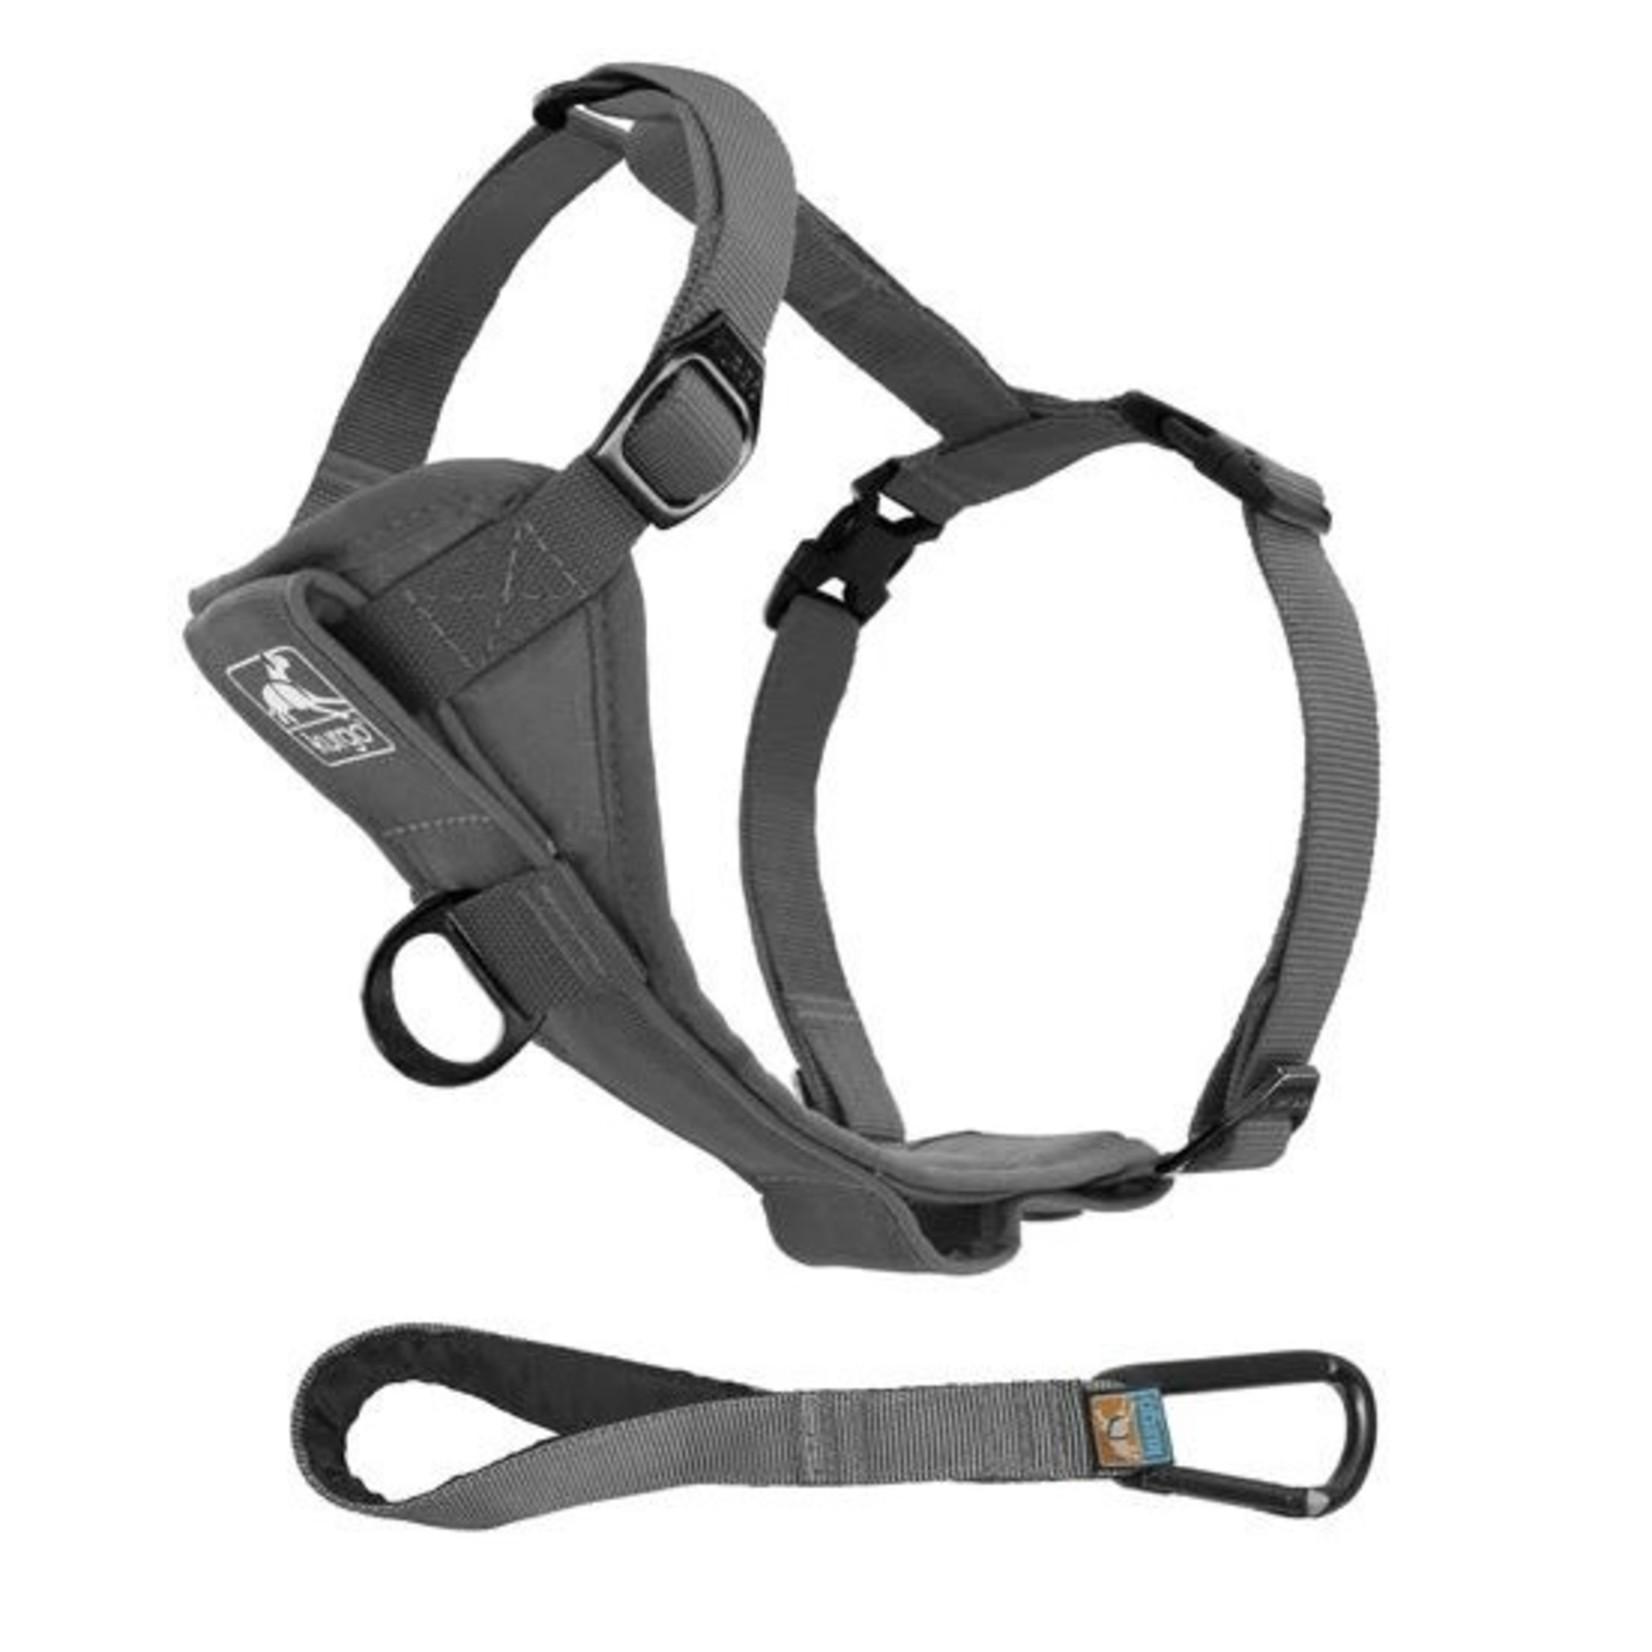 Kurgo Kurgo Harness Tru-Fit Smart Grey S